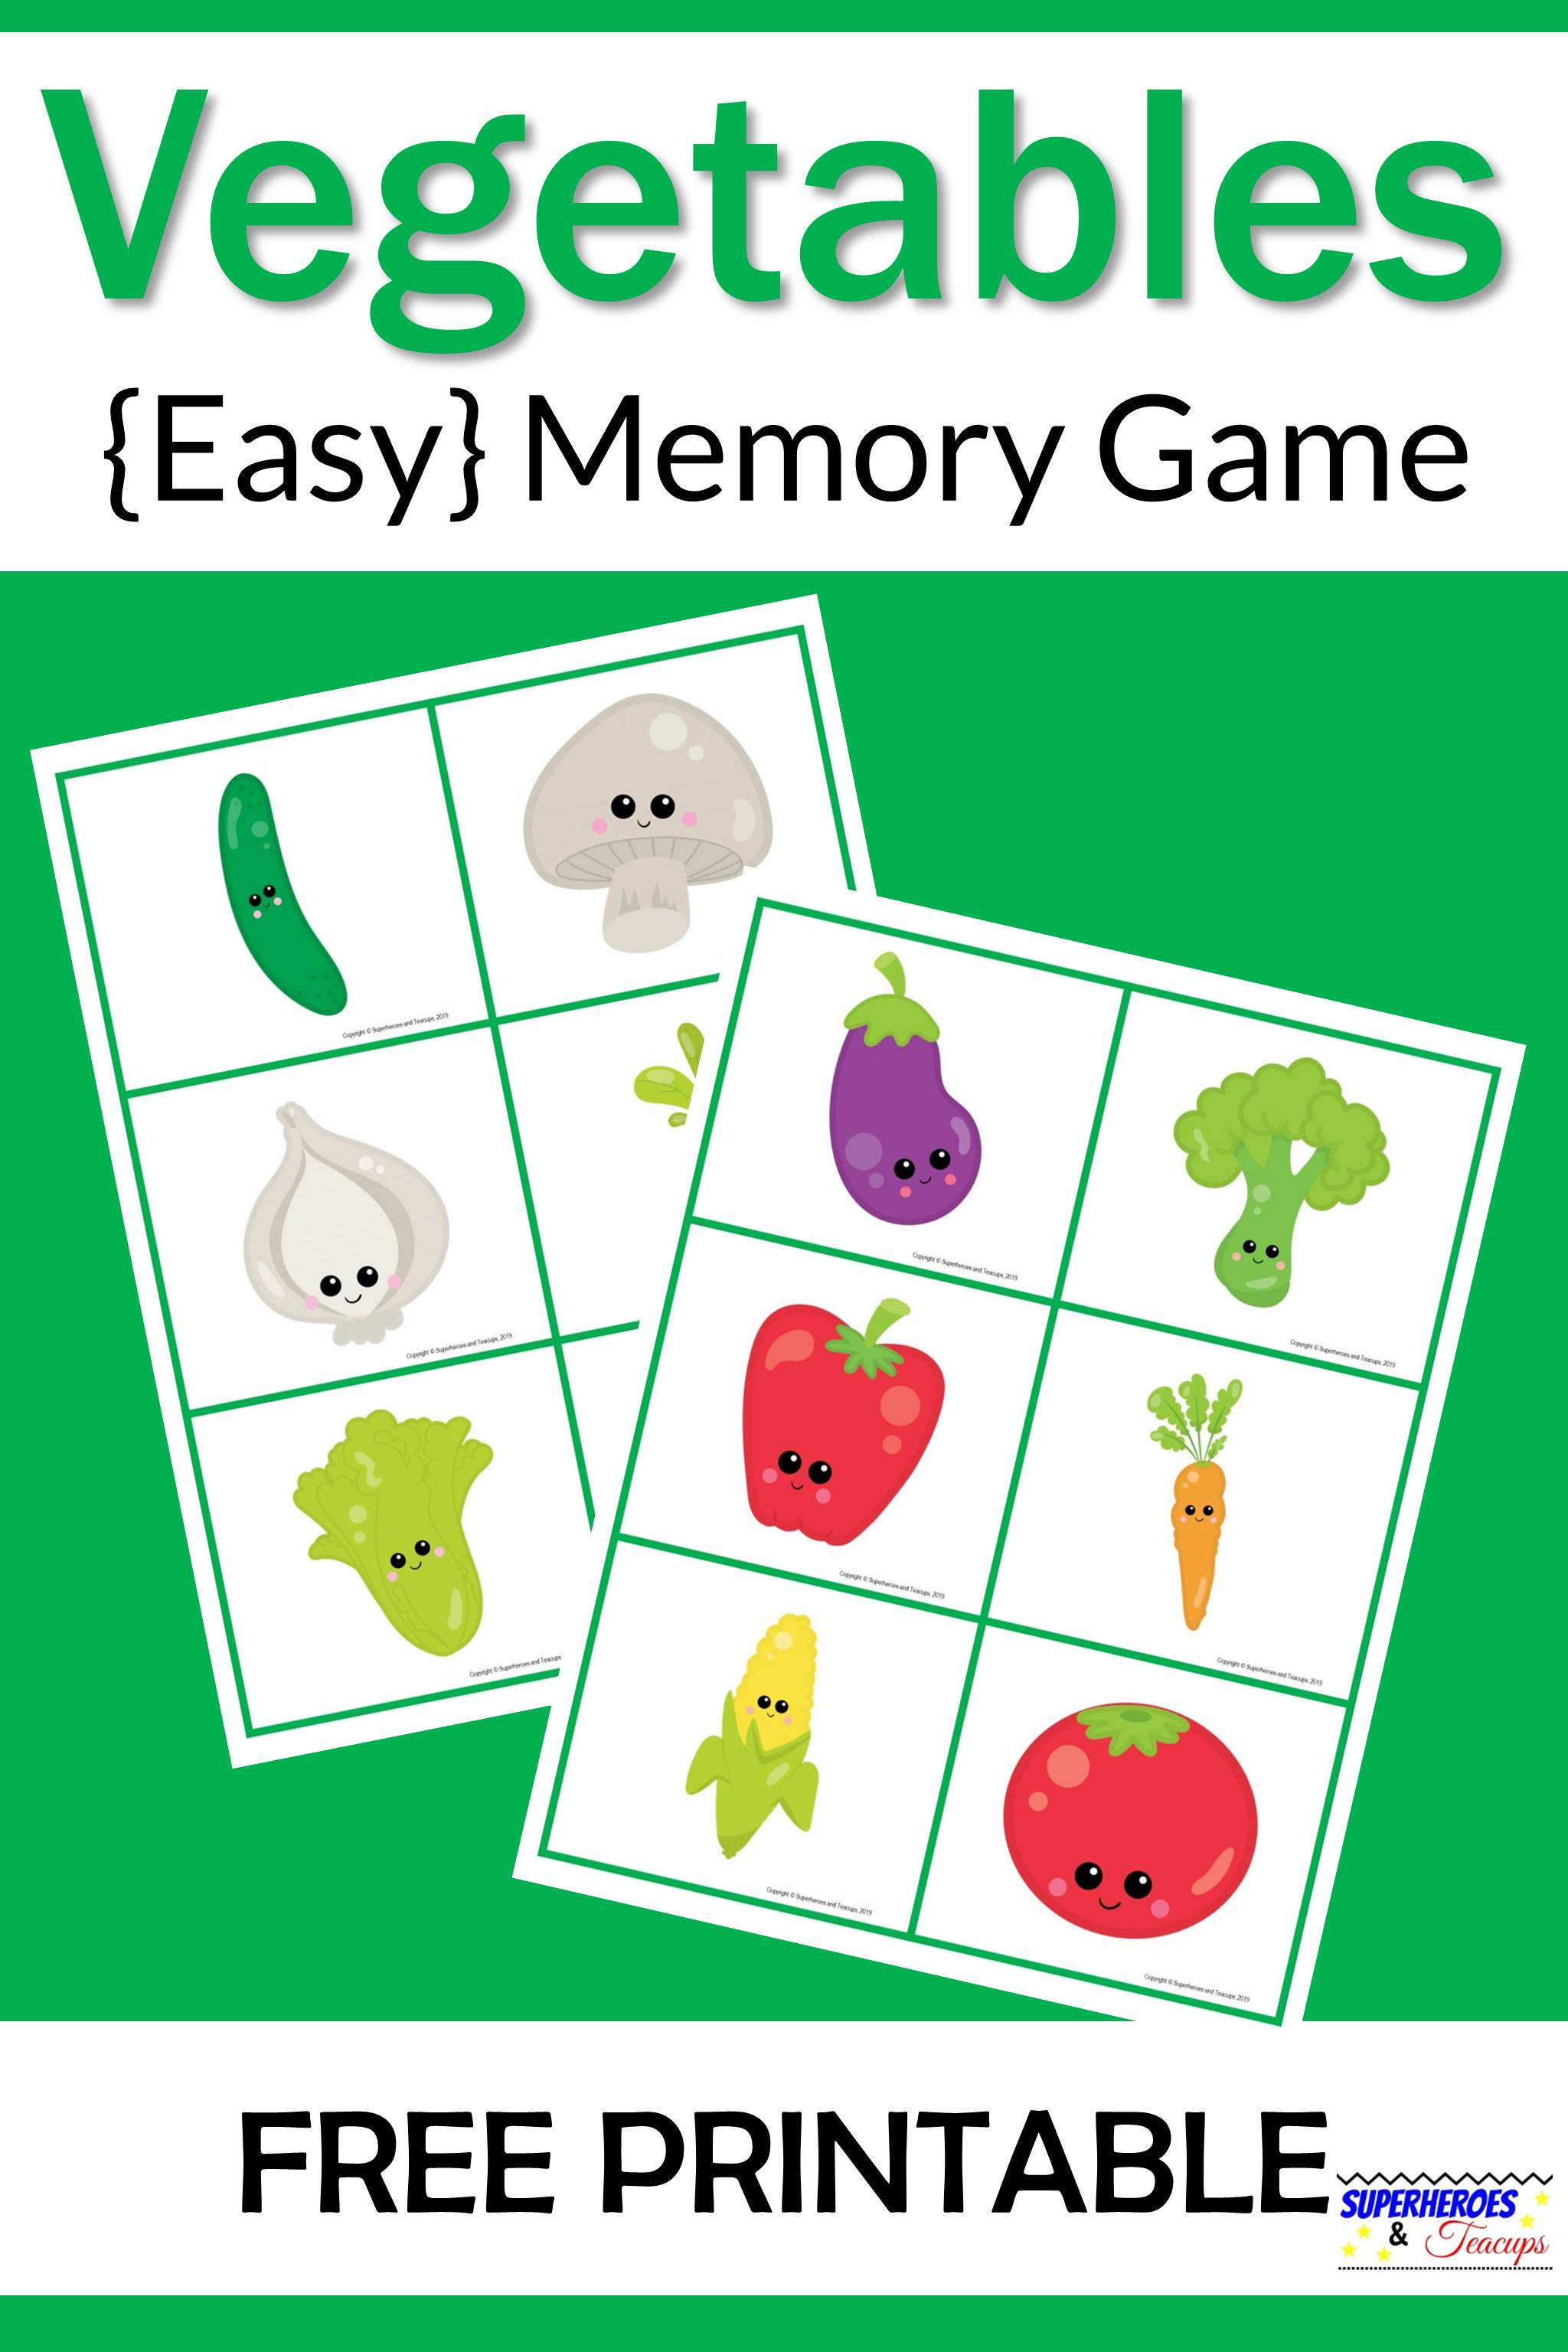 Vegetables Memory Game Free Printable For Kids